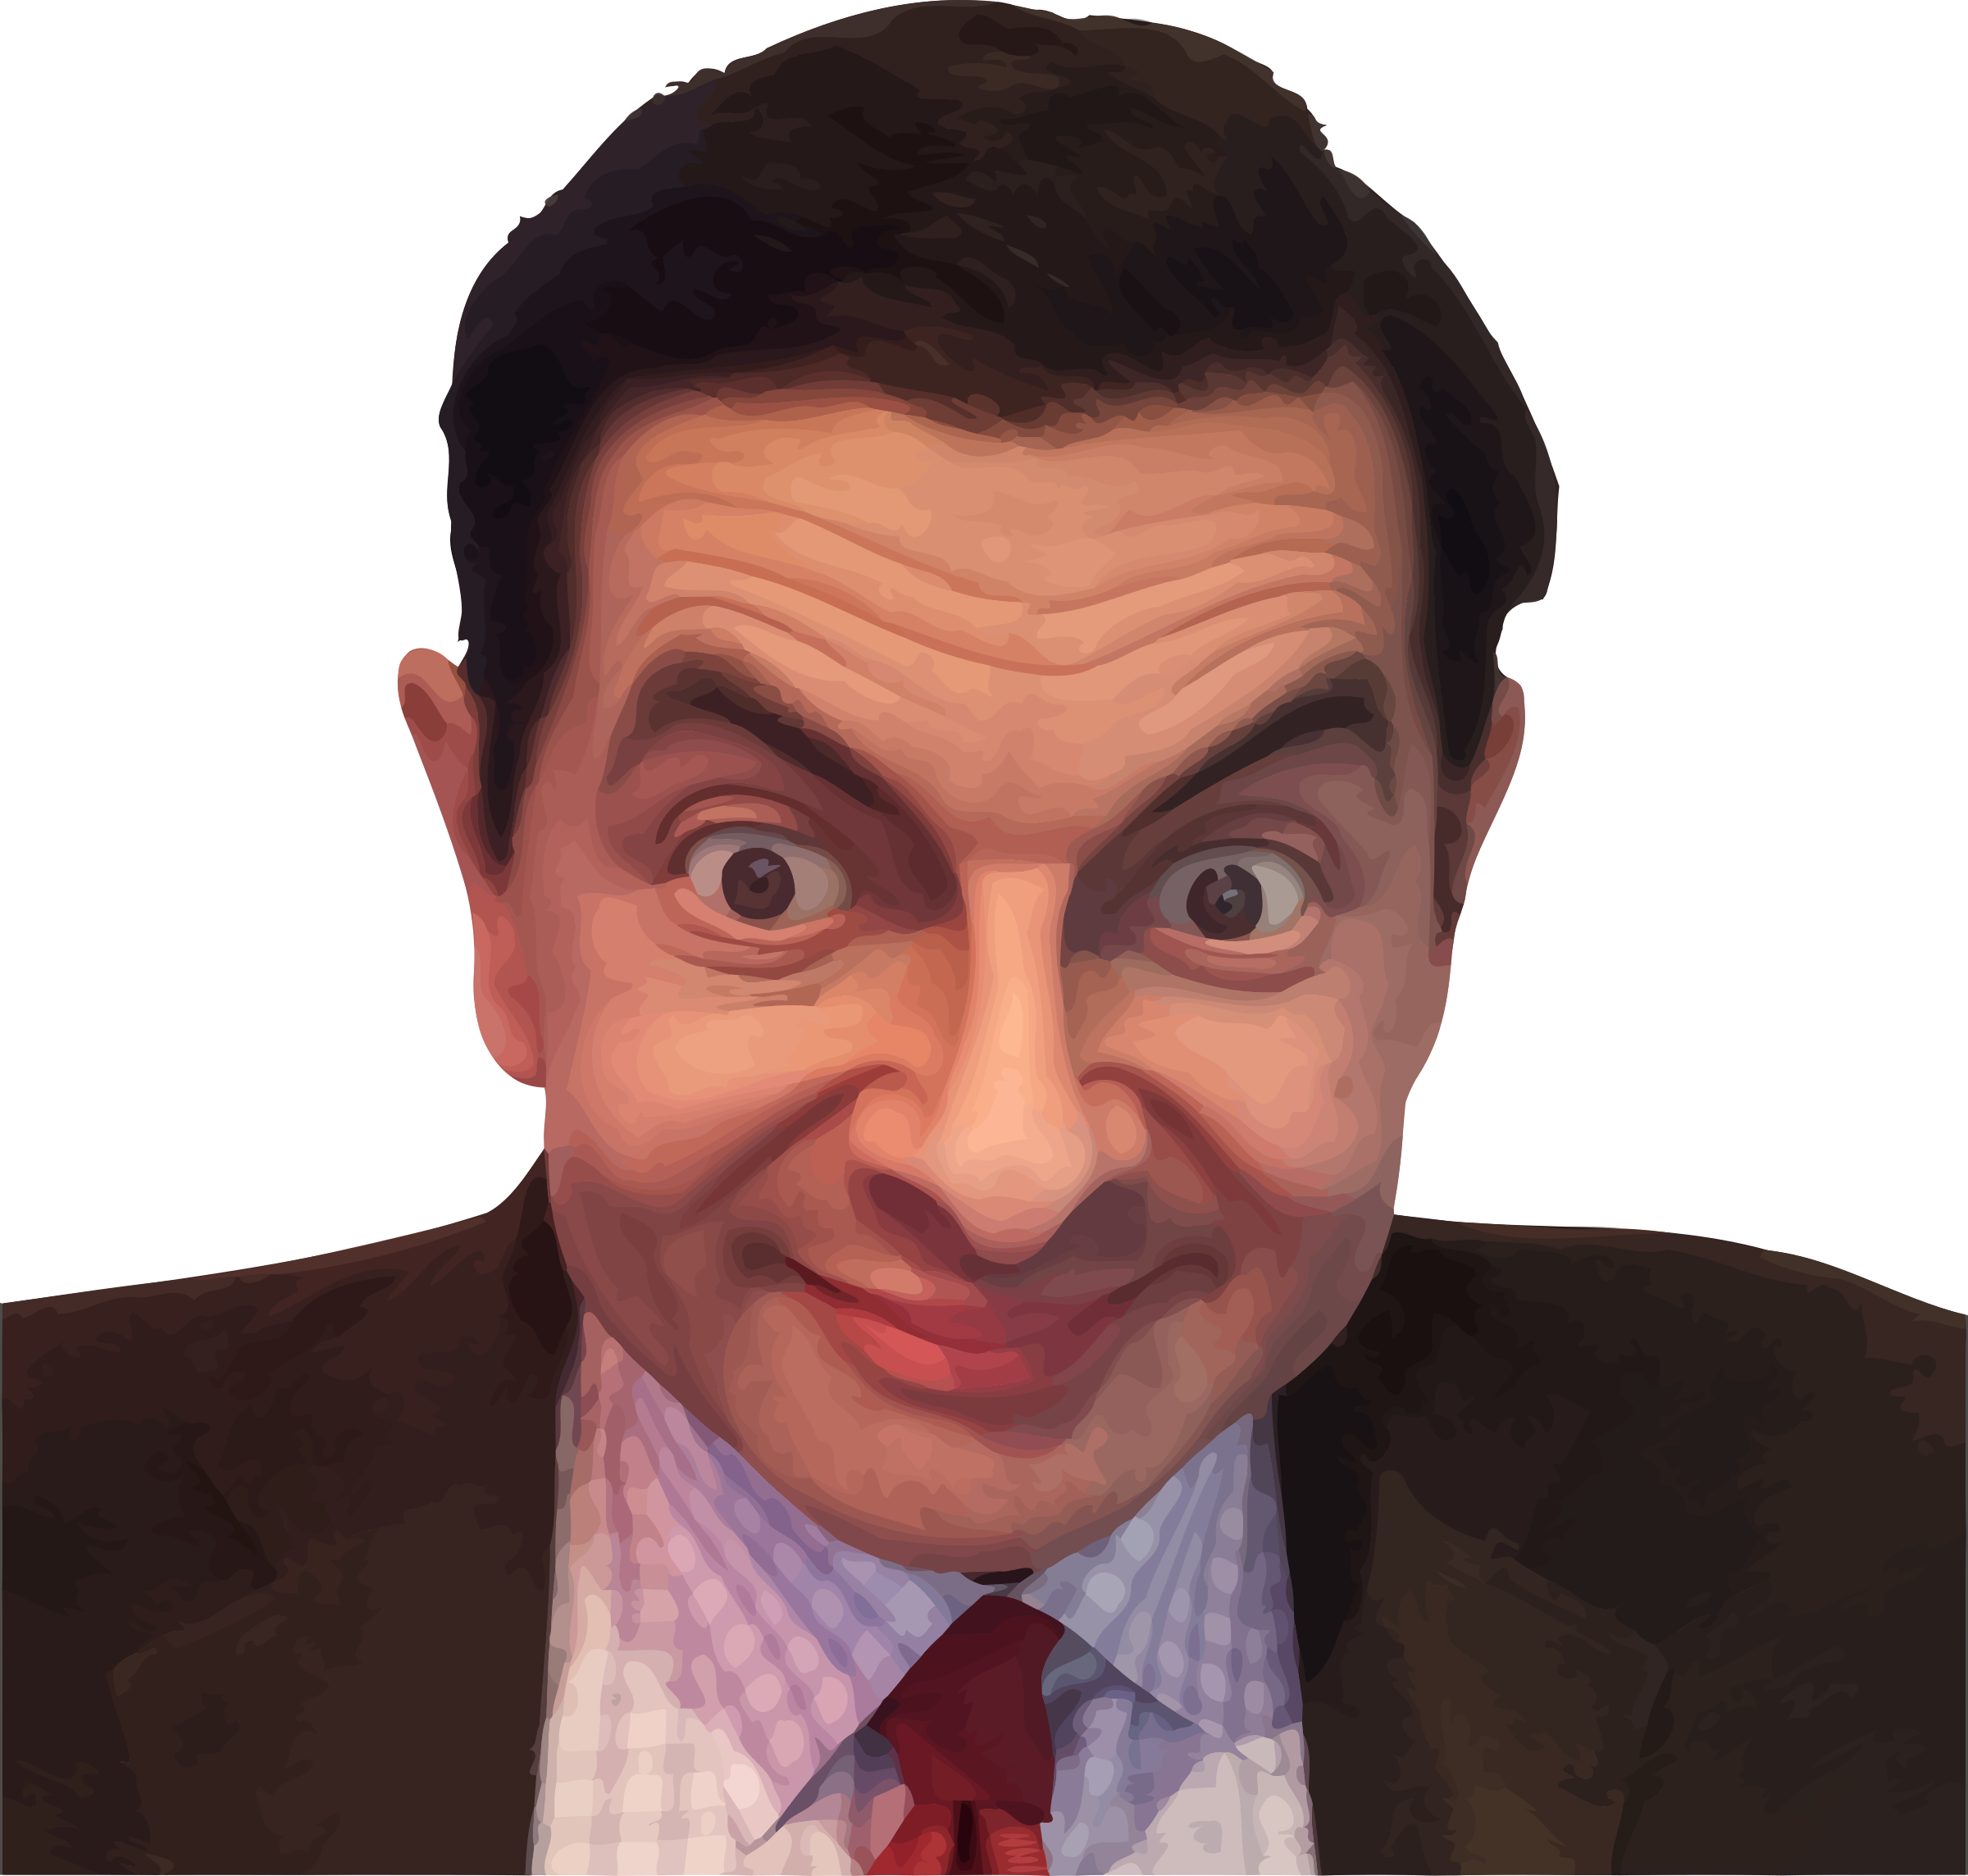 Mr Bean Rowan Atkinson Png Image British Sitcoms Mr Bean Comic Actor